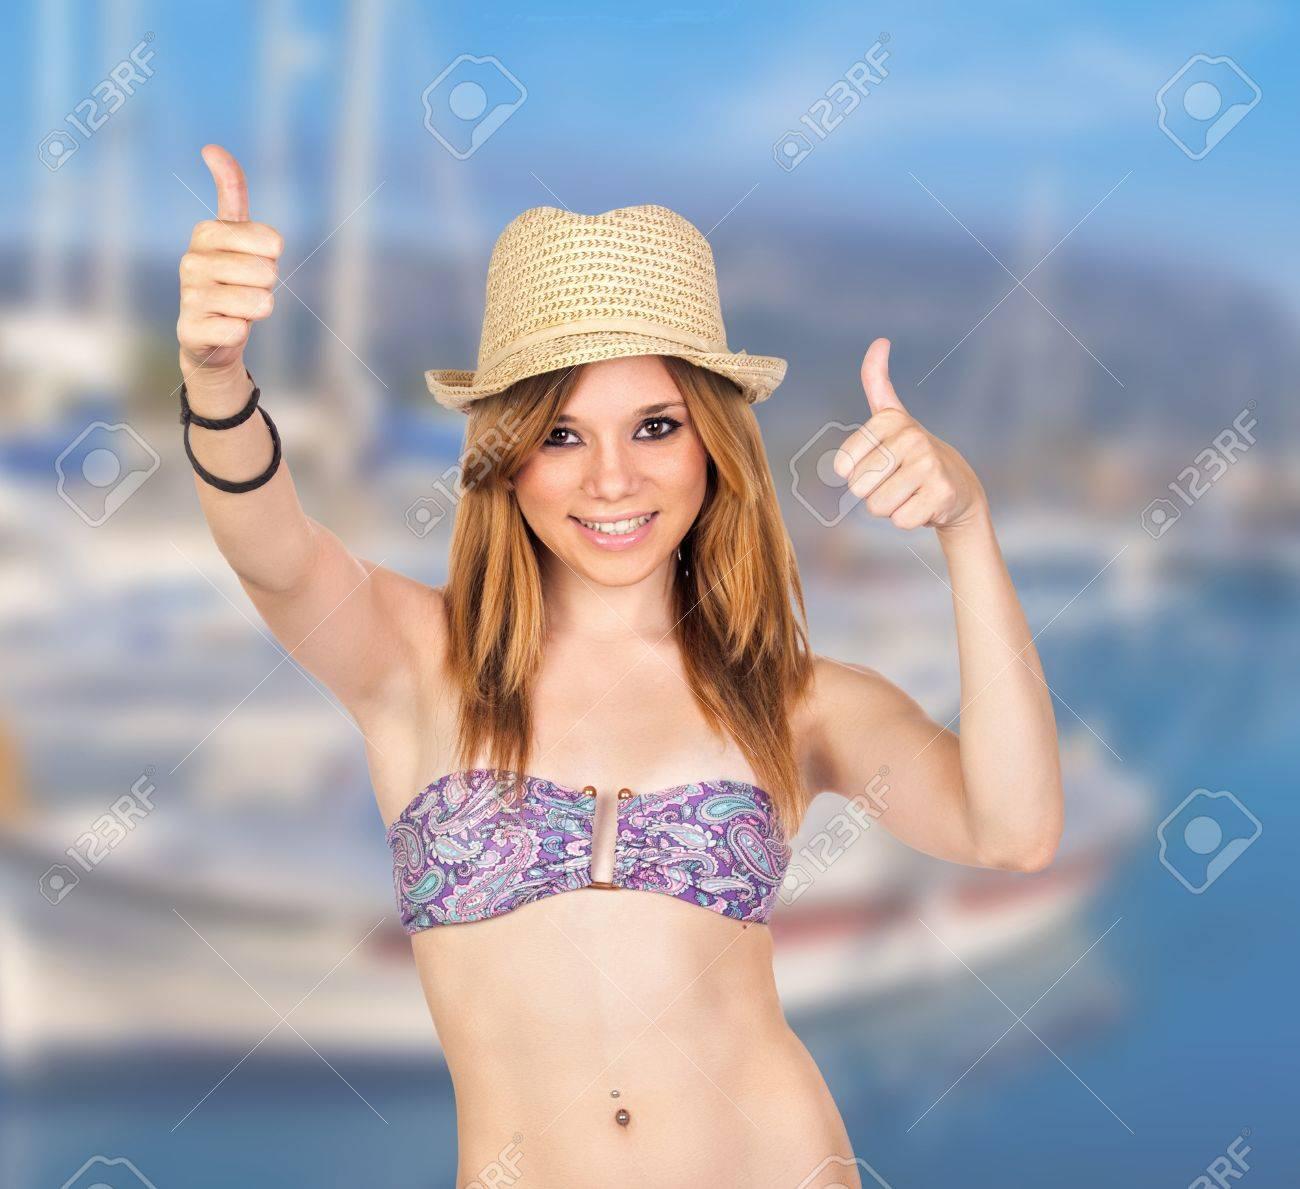 Young Casual Girl with Bikini in Summer Holiday Saying Ok Stock Photo - 17237284